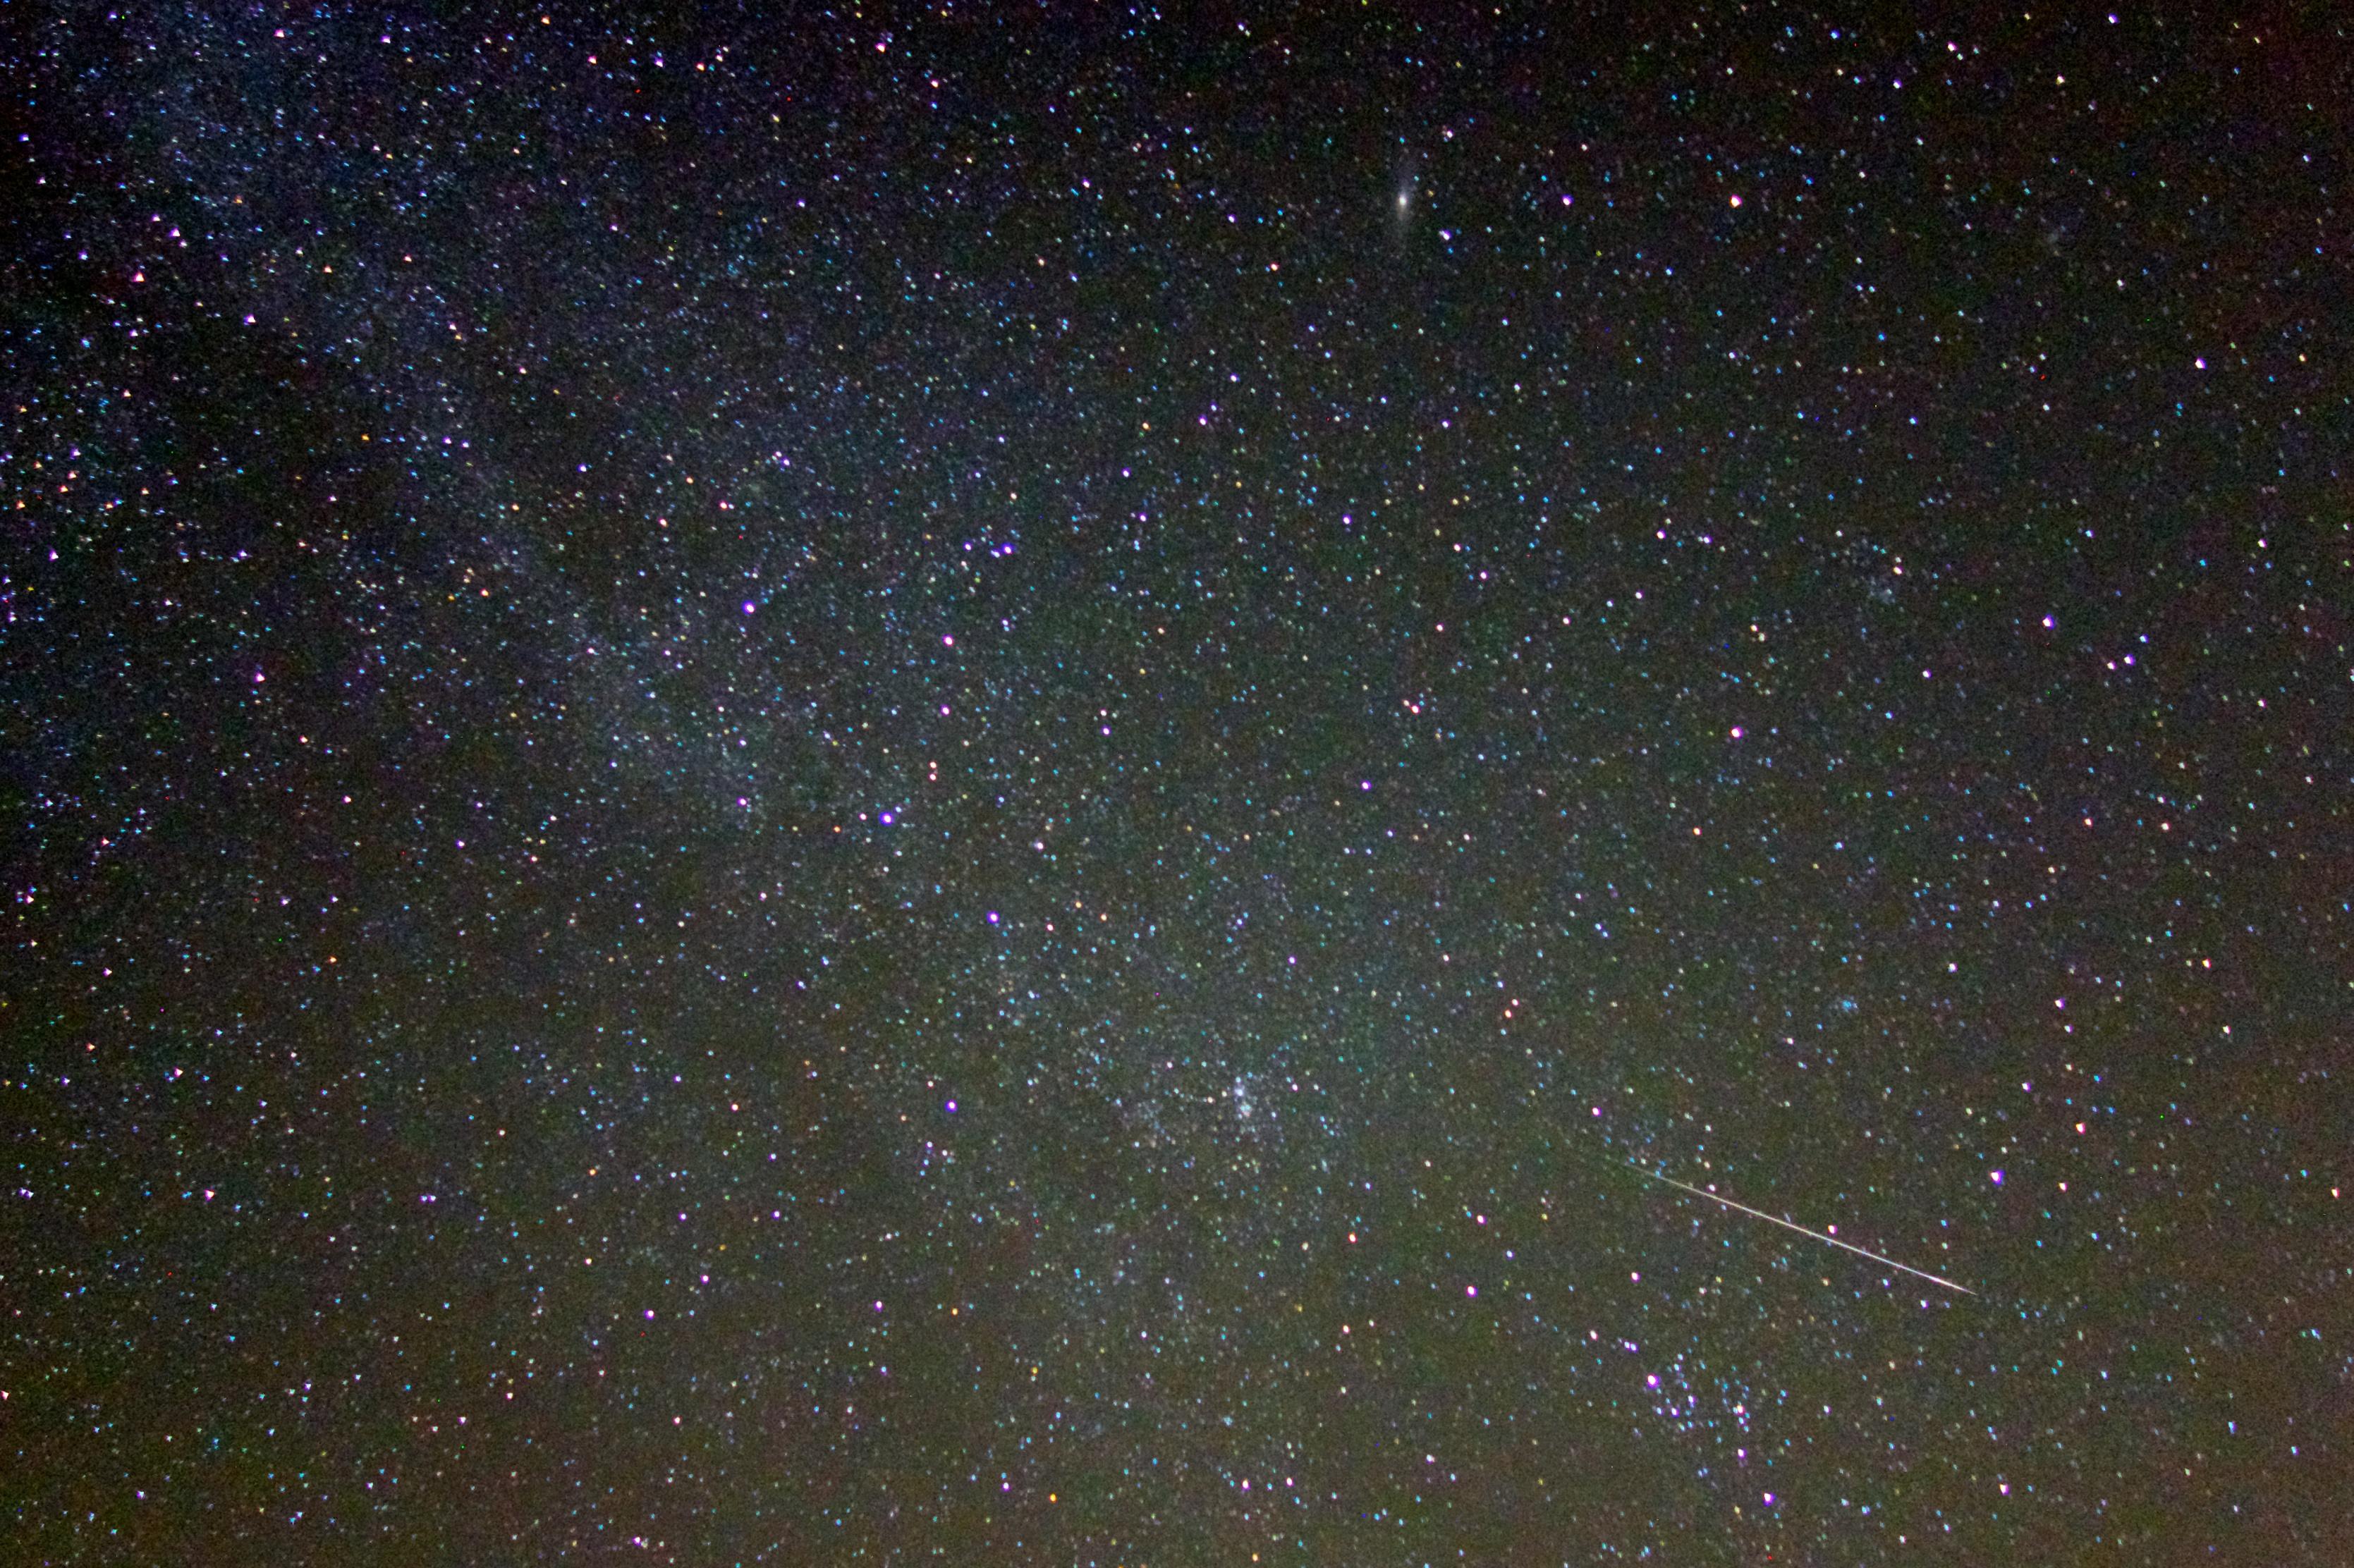 http://sokuup.net/imgs/soku_28085.jpg :: 風景 自然 天体 星空 ... : l 換算 : すべての講義